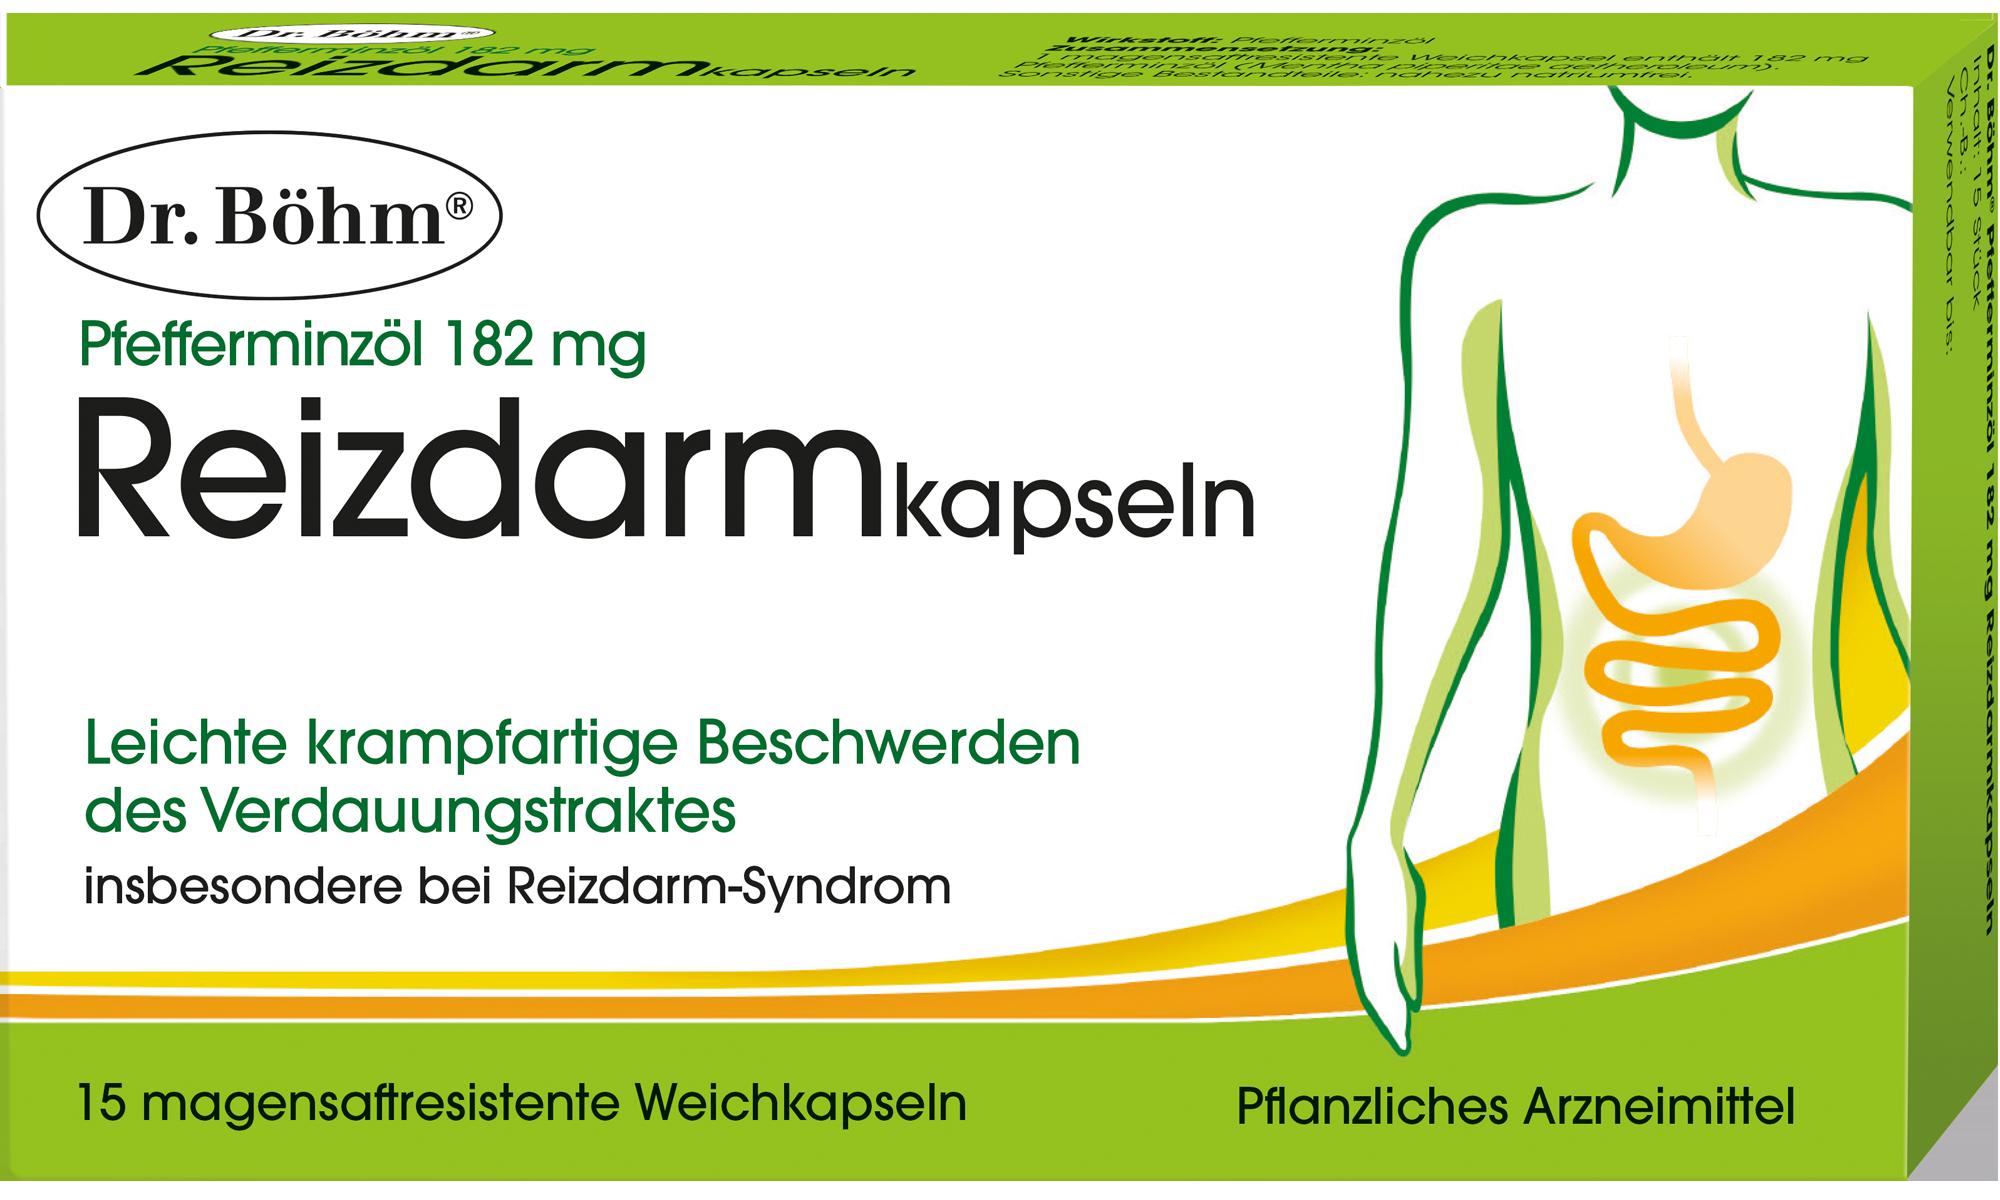 Dr. Böhm® Reizdarmkapseln, Pfefferminzöl 182 mg, Pflanzliches Arzneimittel